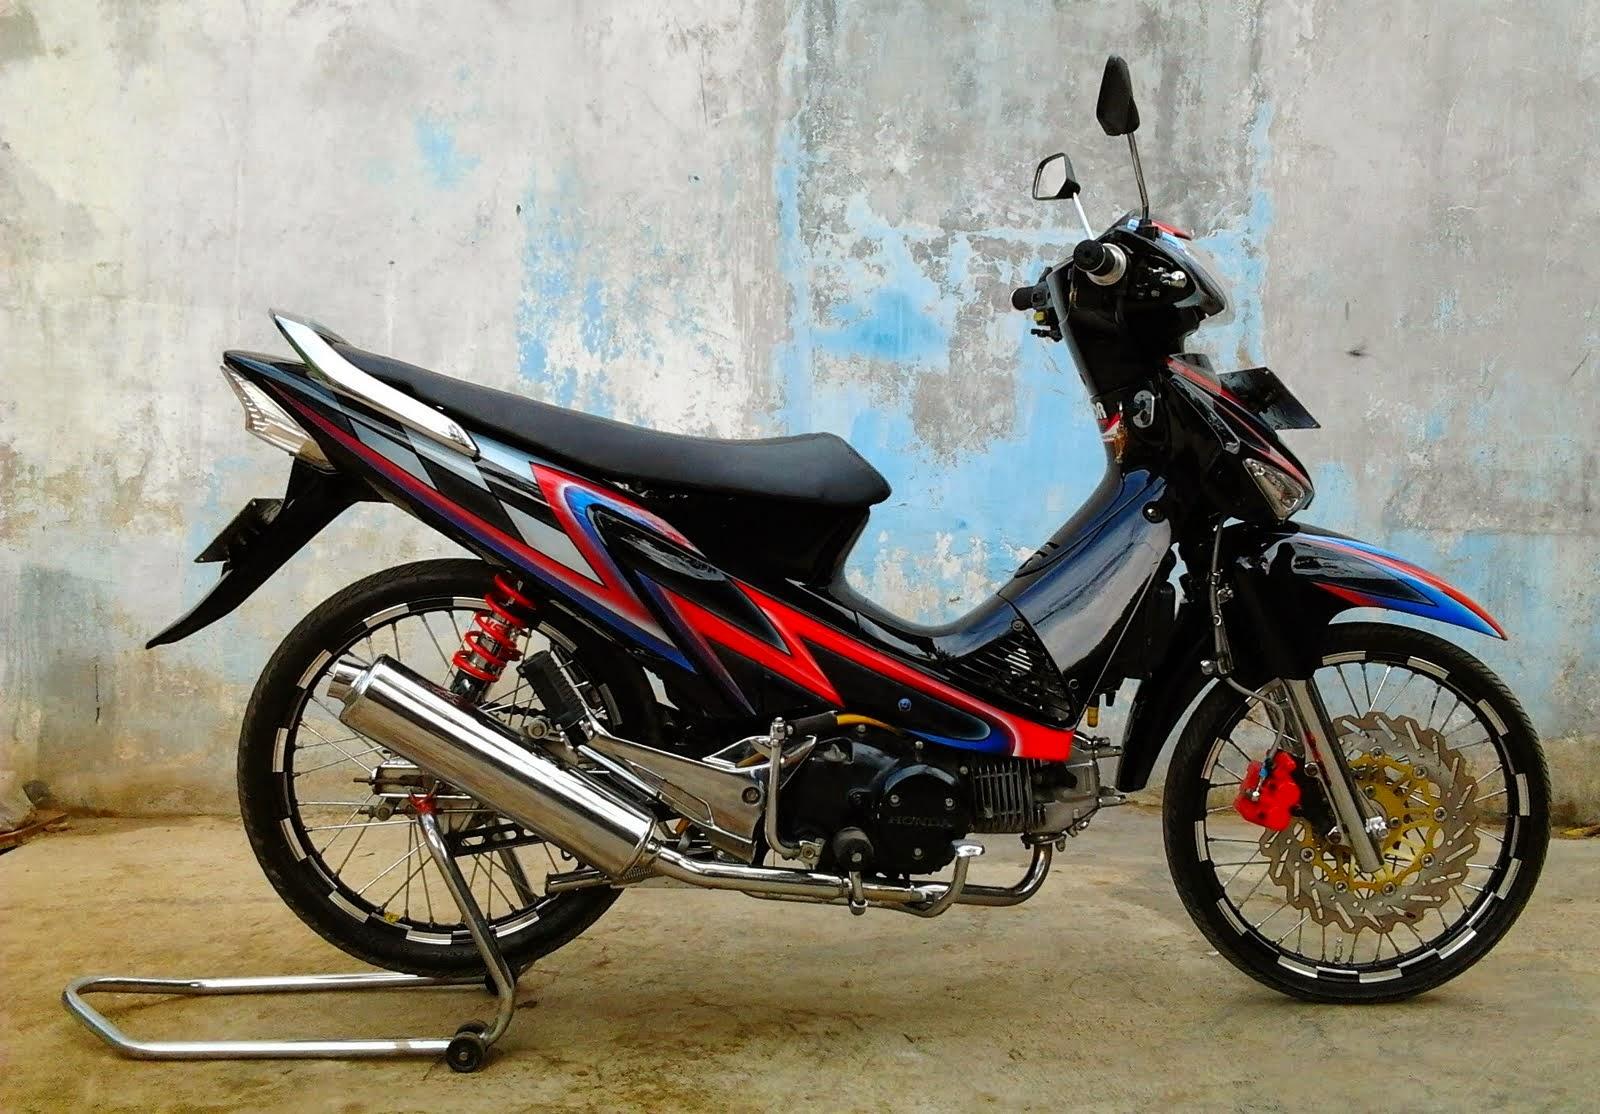 Kumpulan Modifikasi Motor Supra X 125 Bandung Terbaru Modifikasi